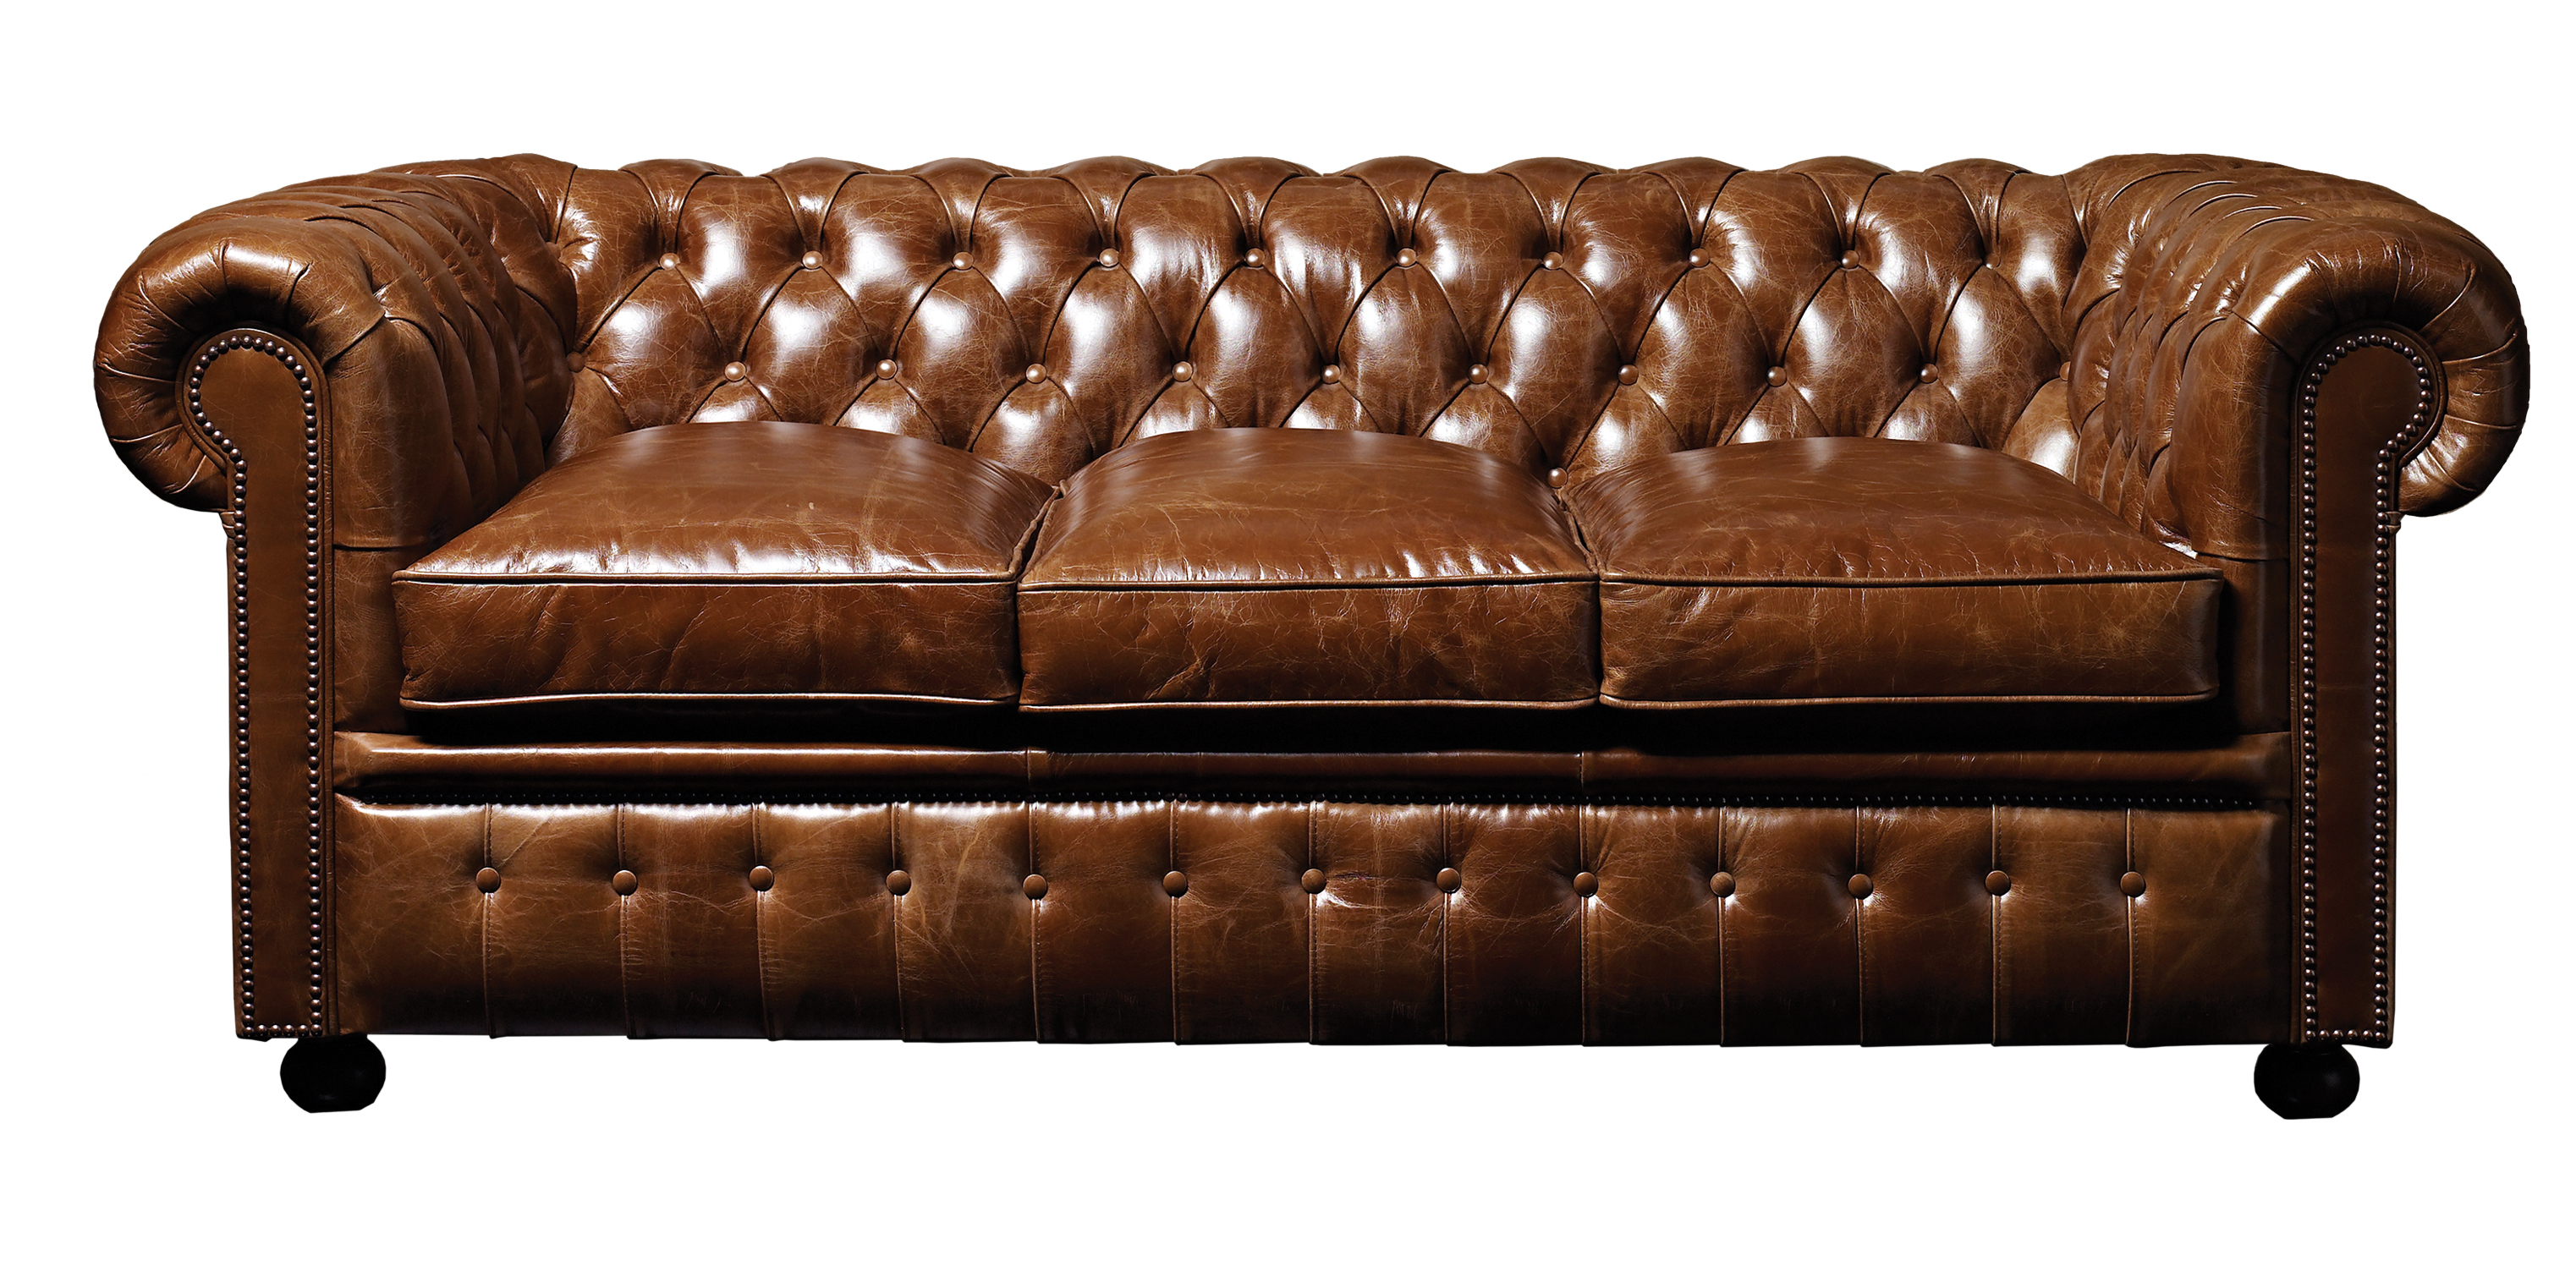 chesterfield sofa william-blake-tan-chesterfield-sofa-for-elegant-living- MSZOKQU